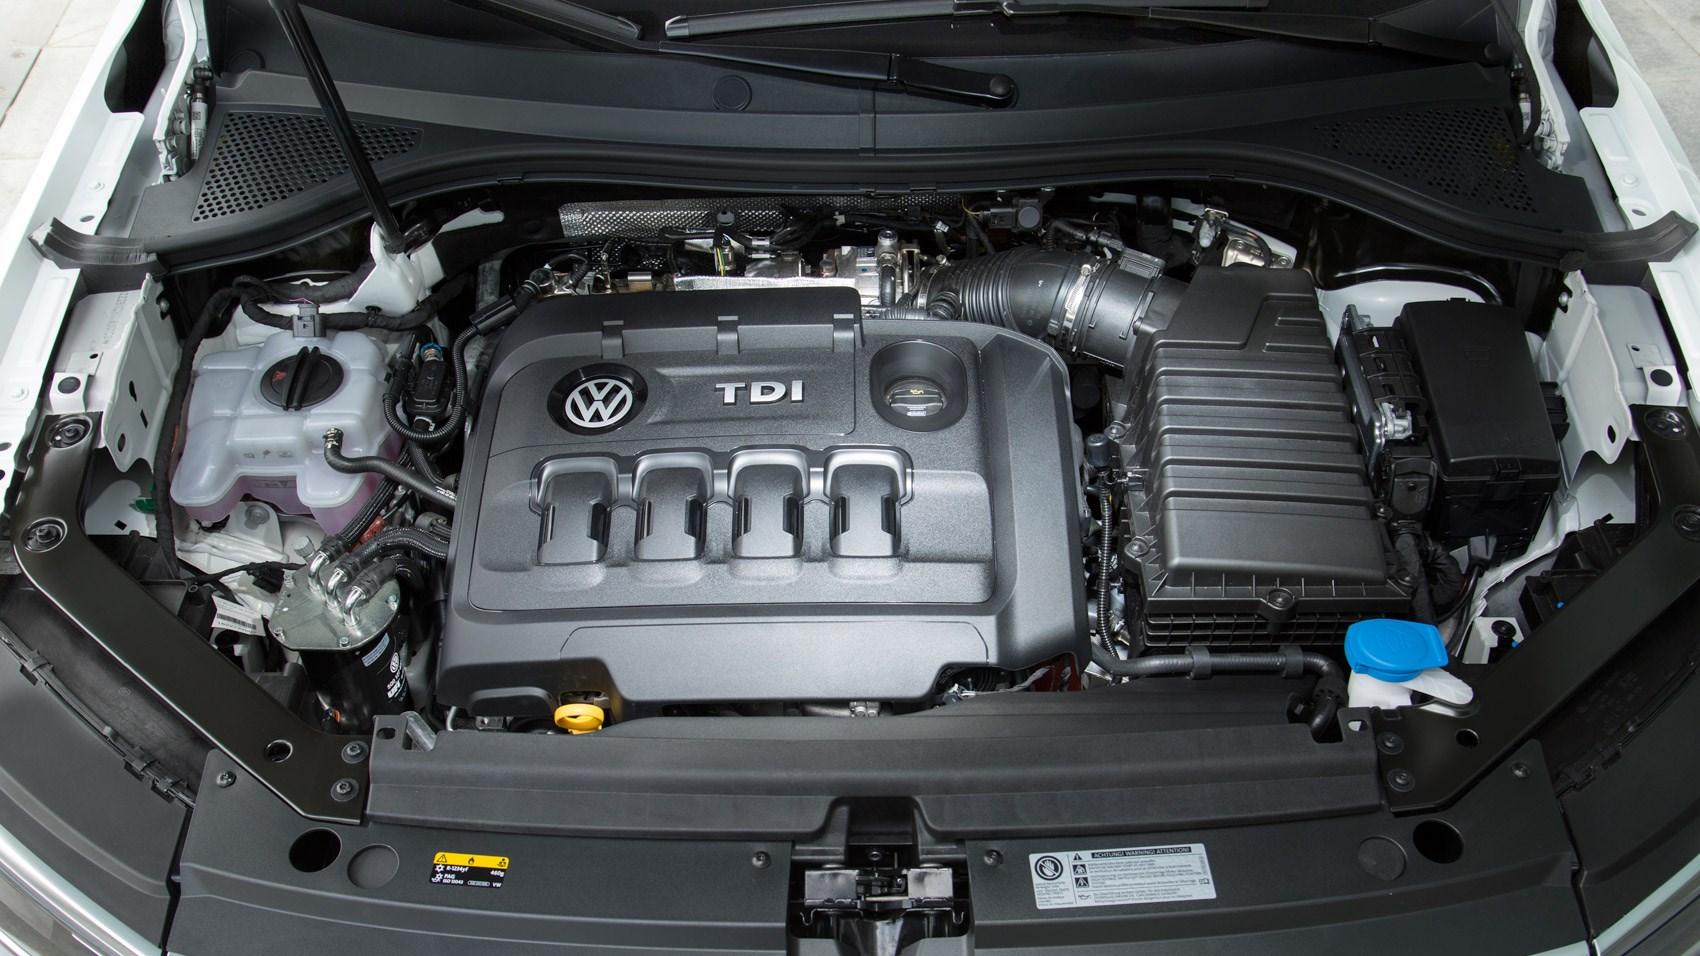 Vw Lease Deals >> VW Tiguan 2.0 BiTDI 240 4Motion R-Line (2016) review | CAR Magazine